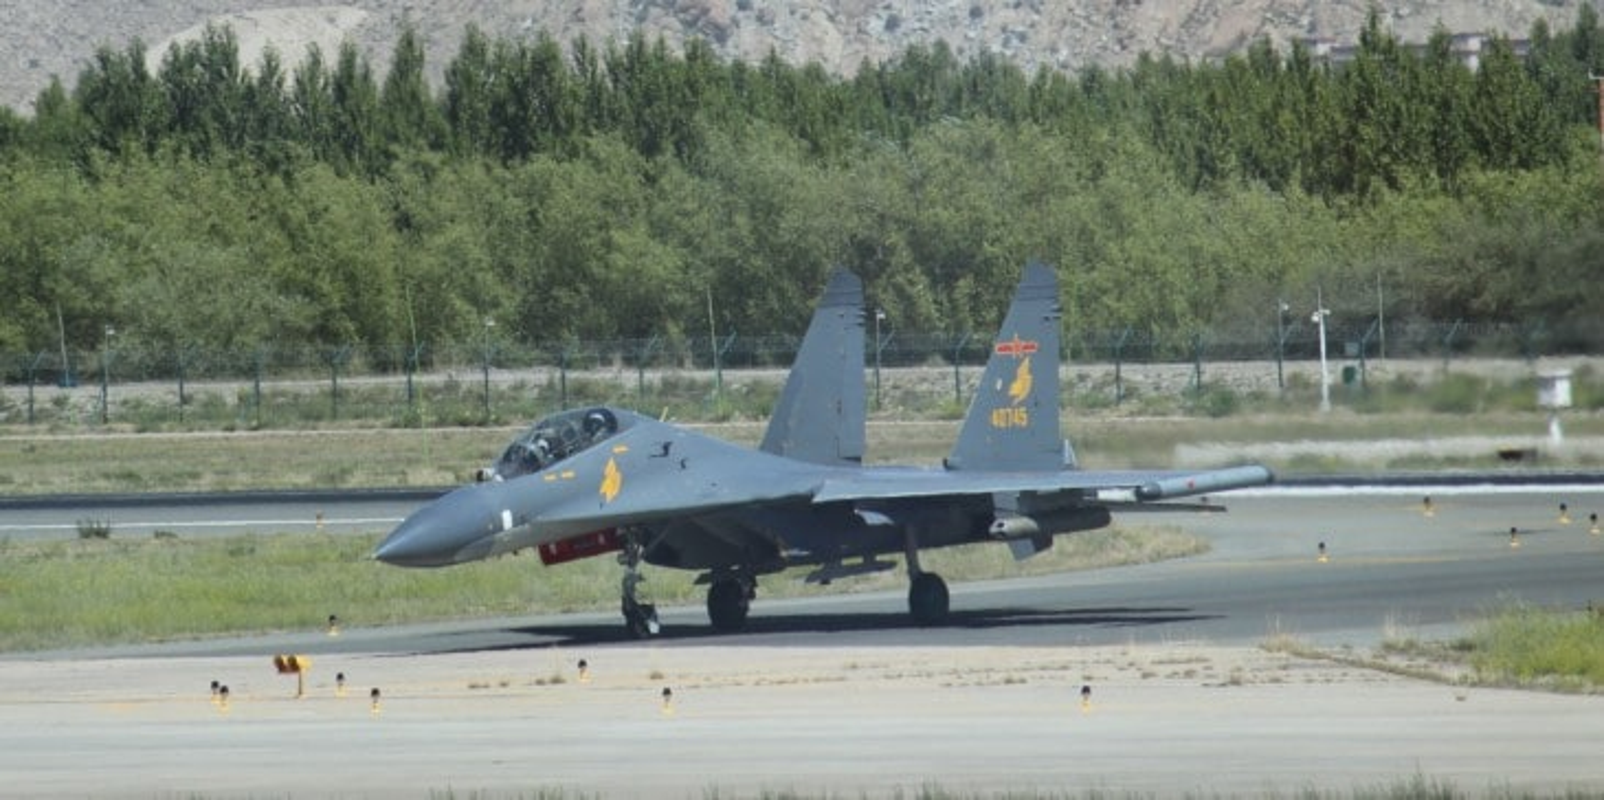 Trung Quoc khoe J-11 khien Nga phai hoi han vi trot ban Su-27-Hinh-7